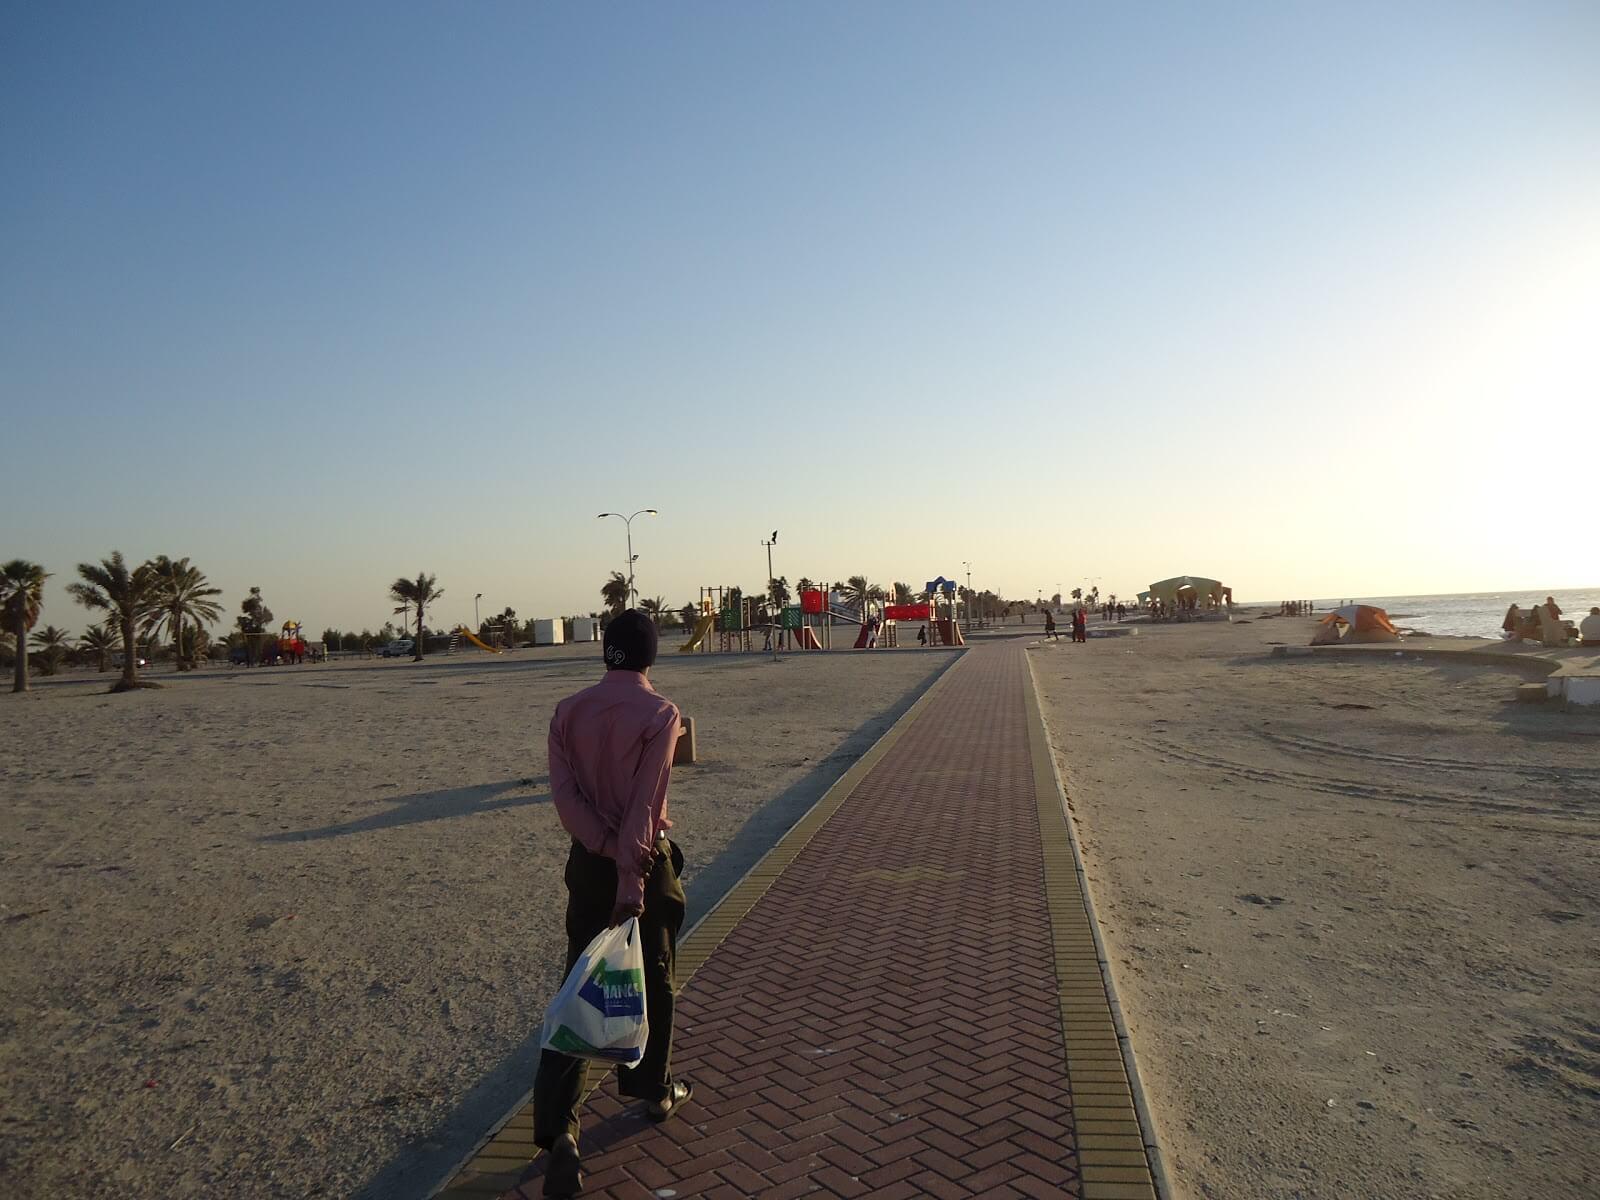 Al Zallaq/Jazaer Beach